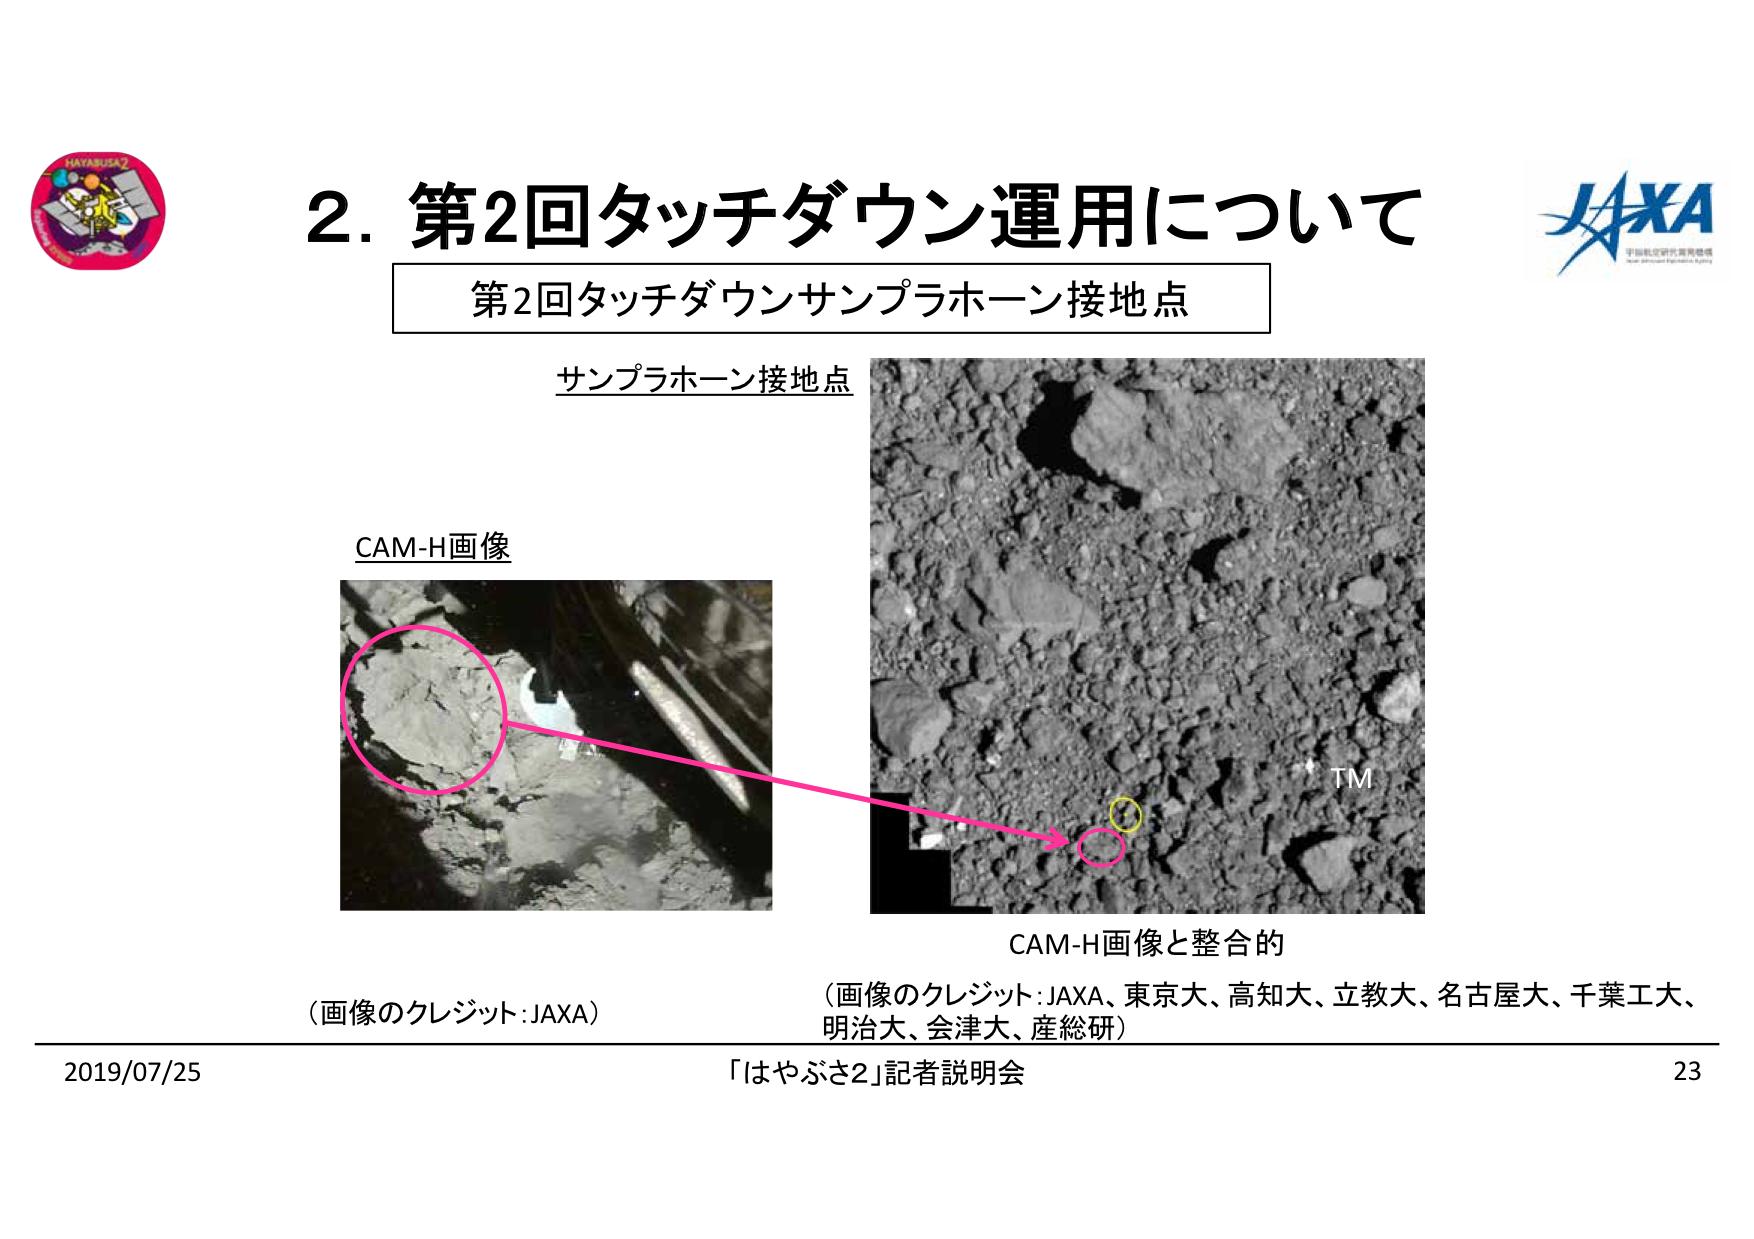 f:id:Imamura:20190725151305p:plain